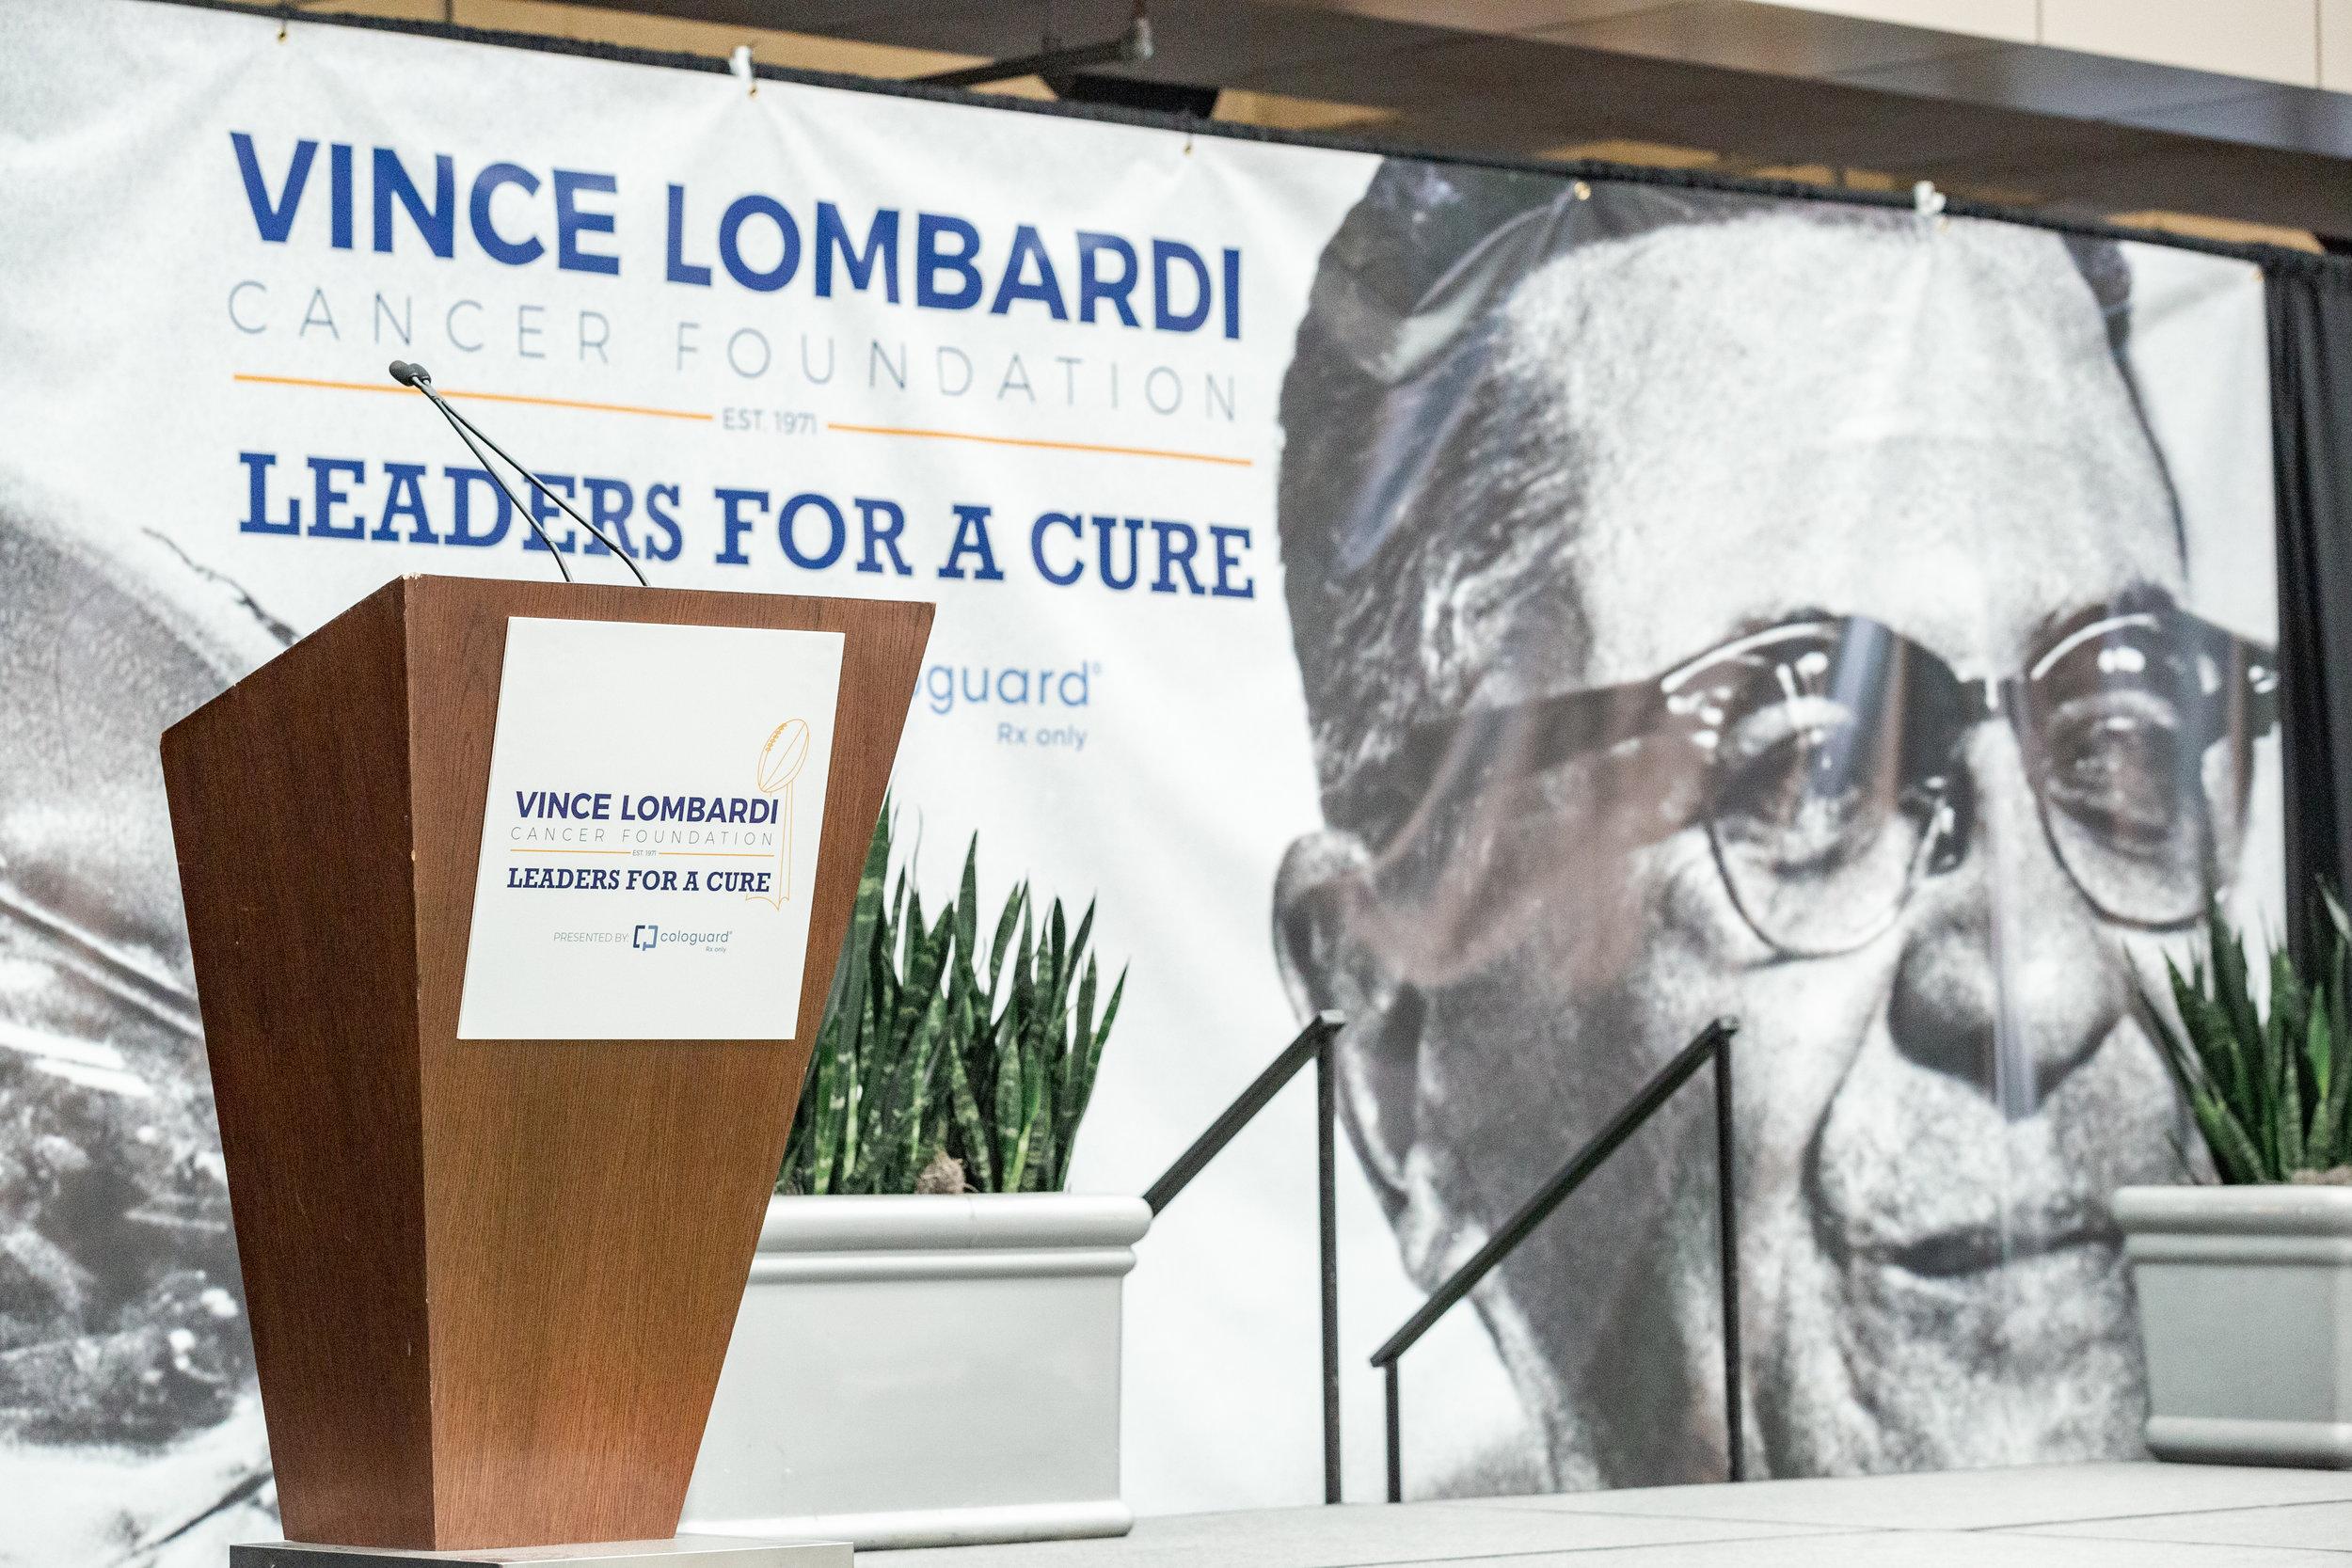 Vince Lombardi Cancer Foundation Event -20190131-0516.jpg